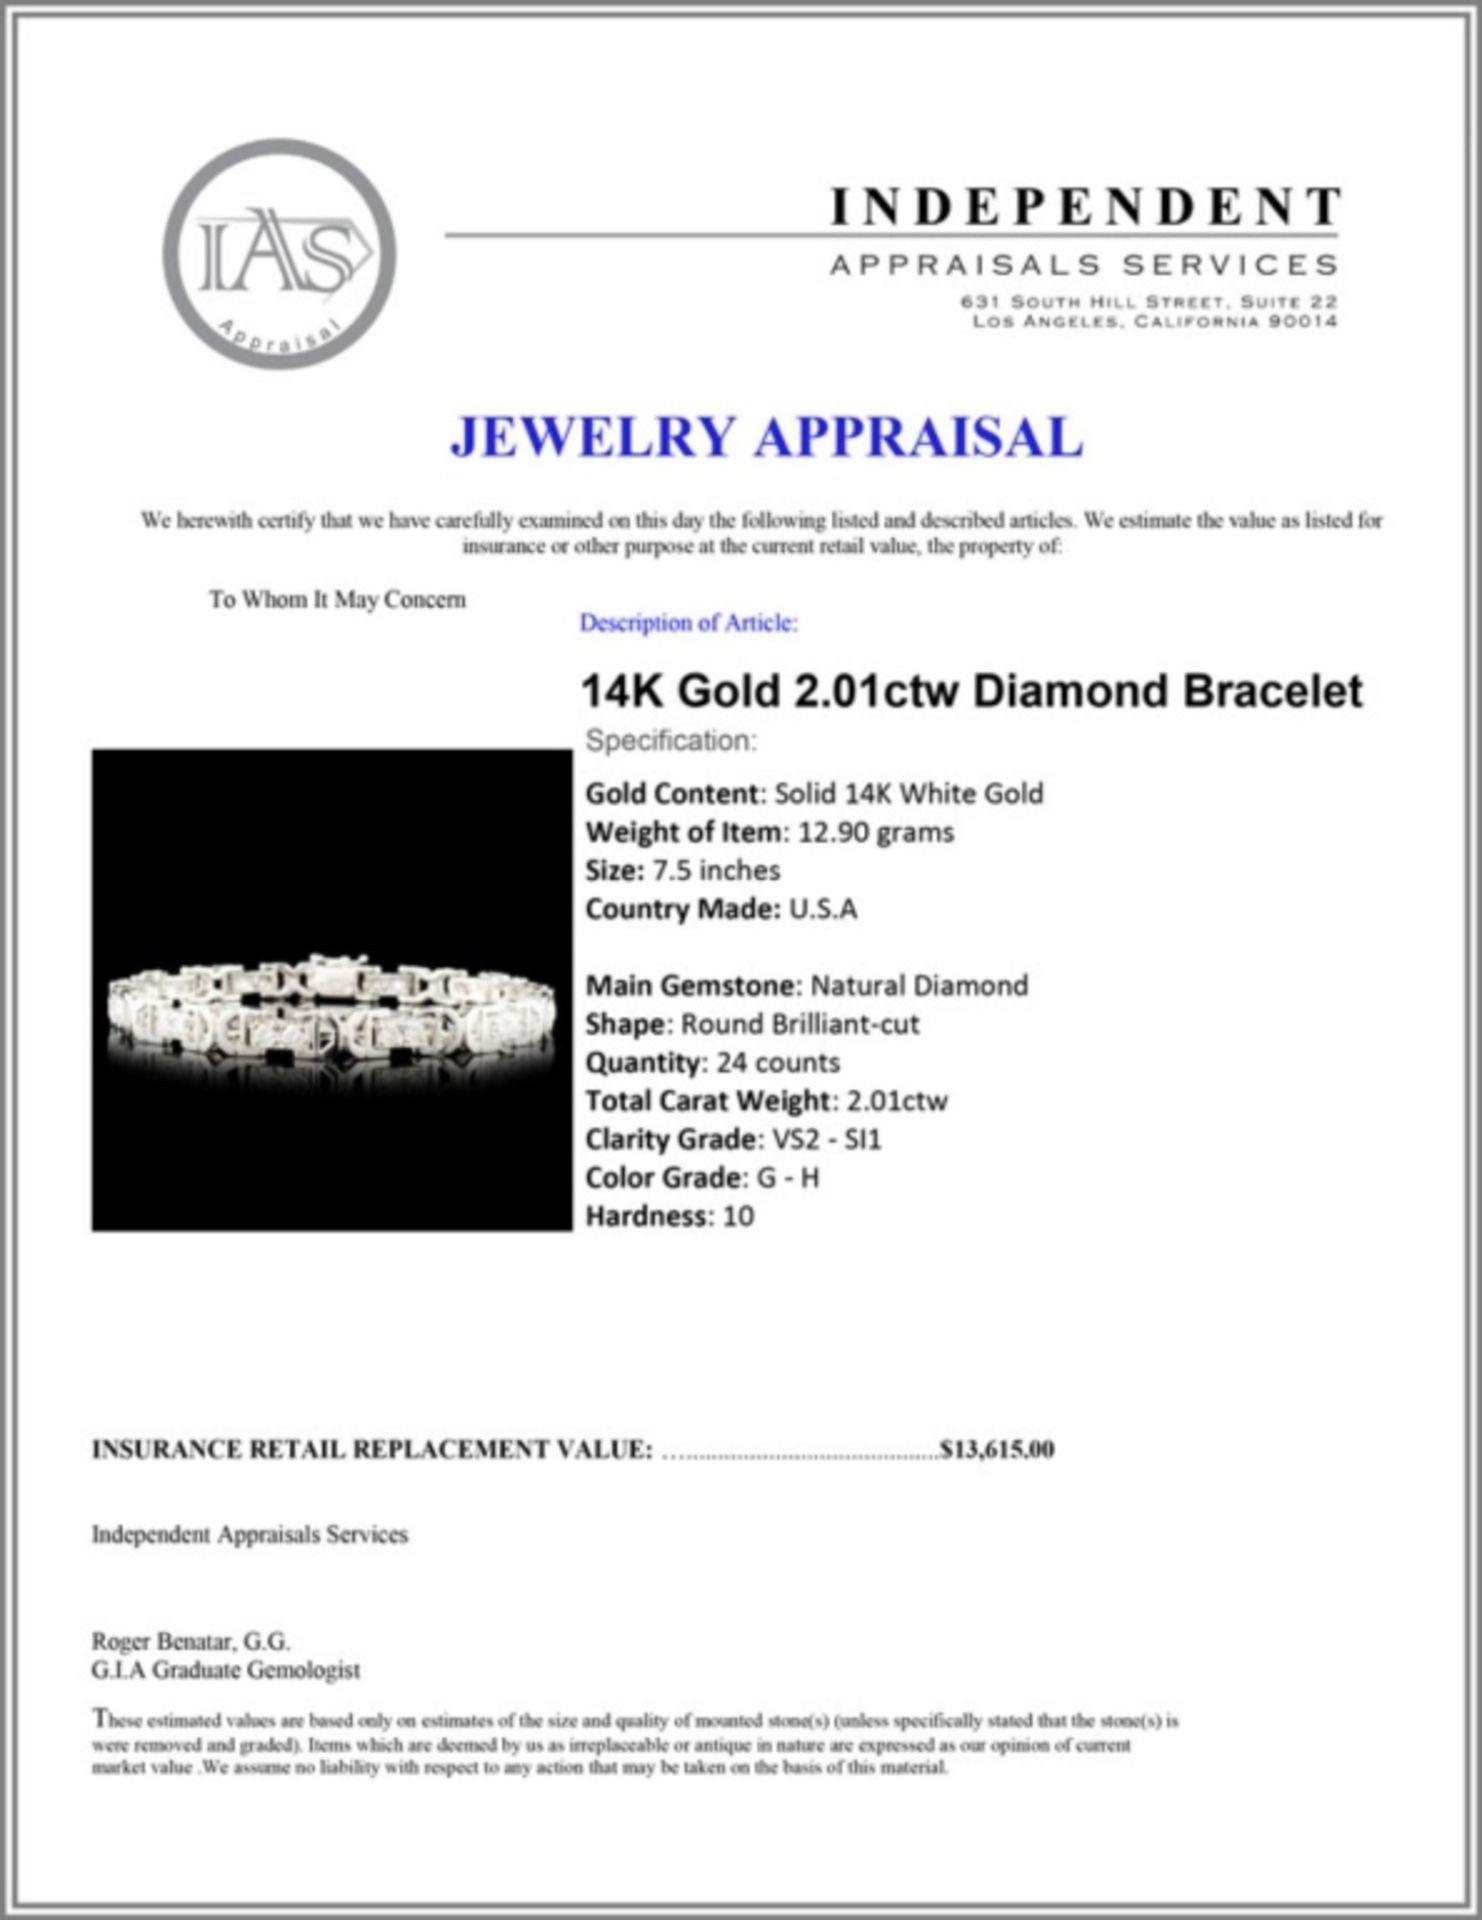 14K Gold 2.01ctw Diamond Bracelet - Image 4 of 4